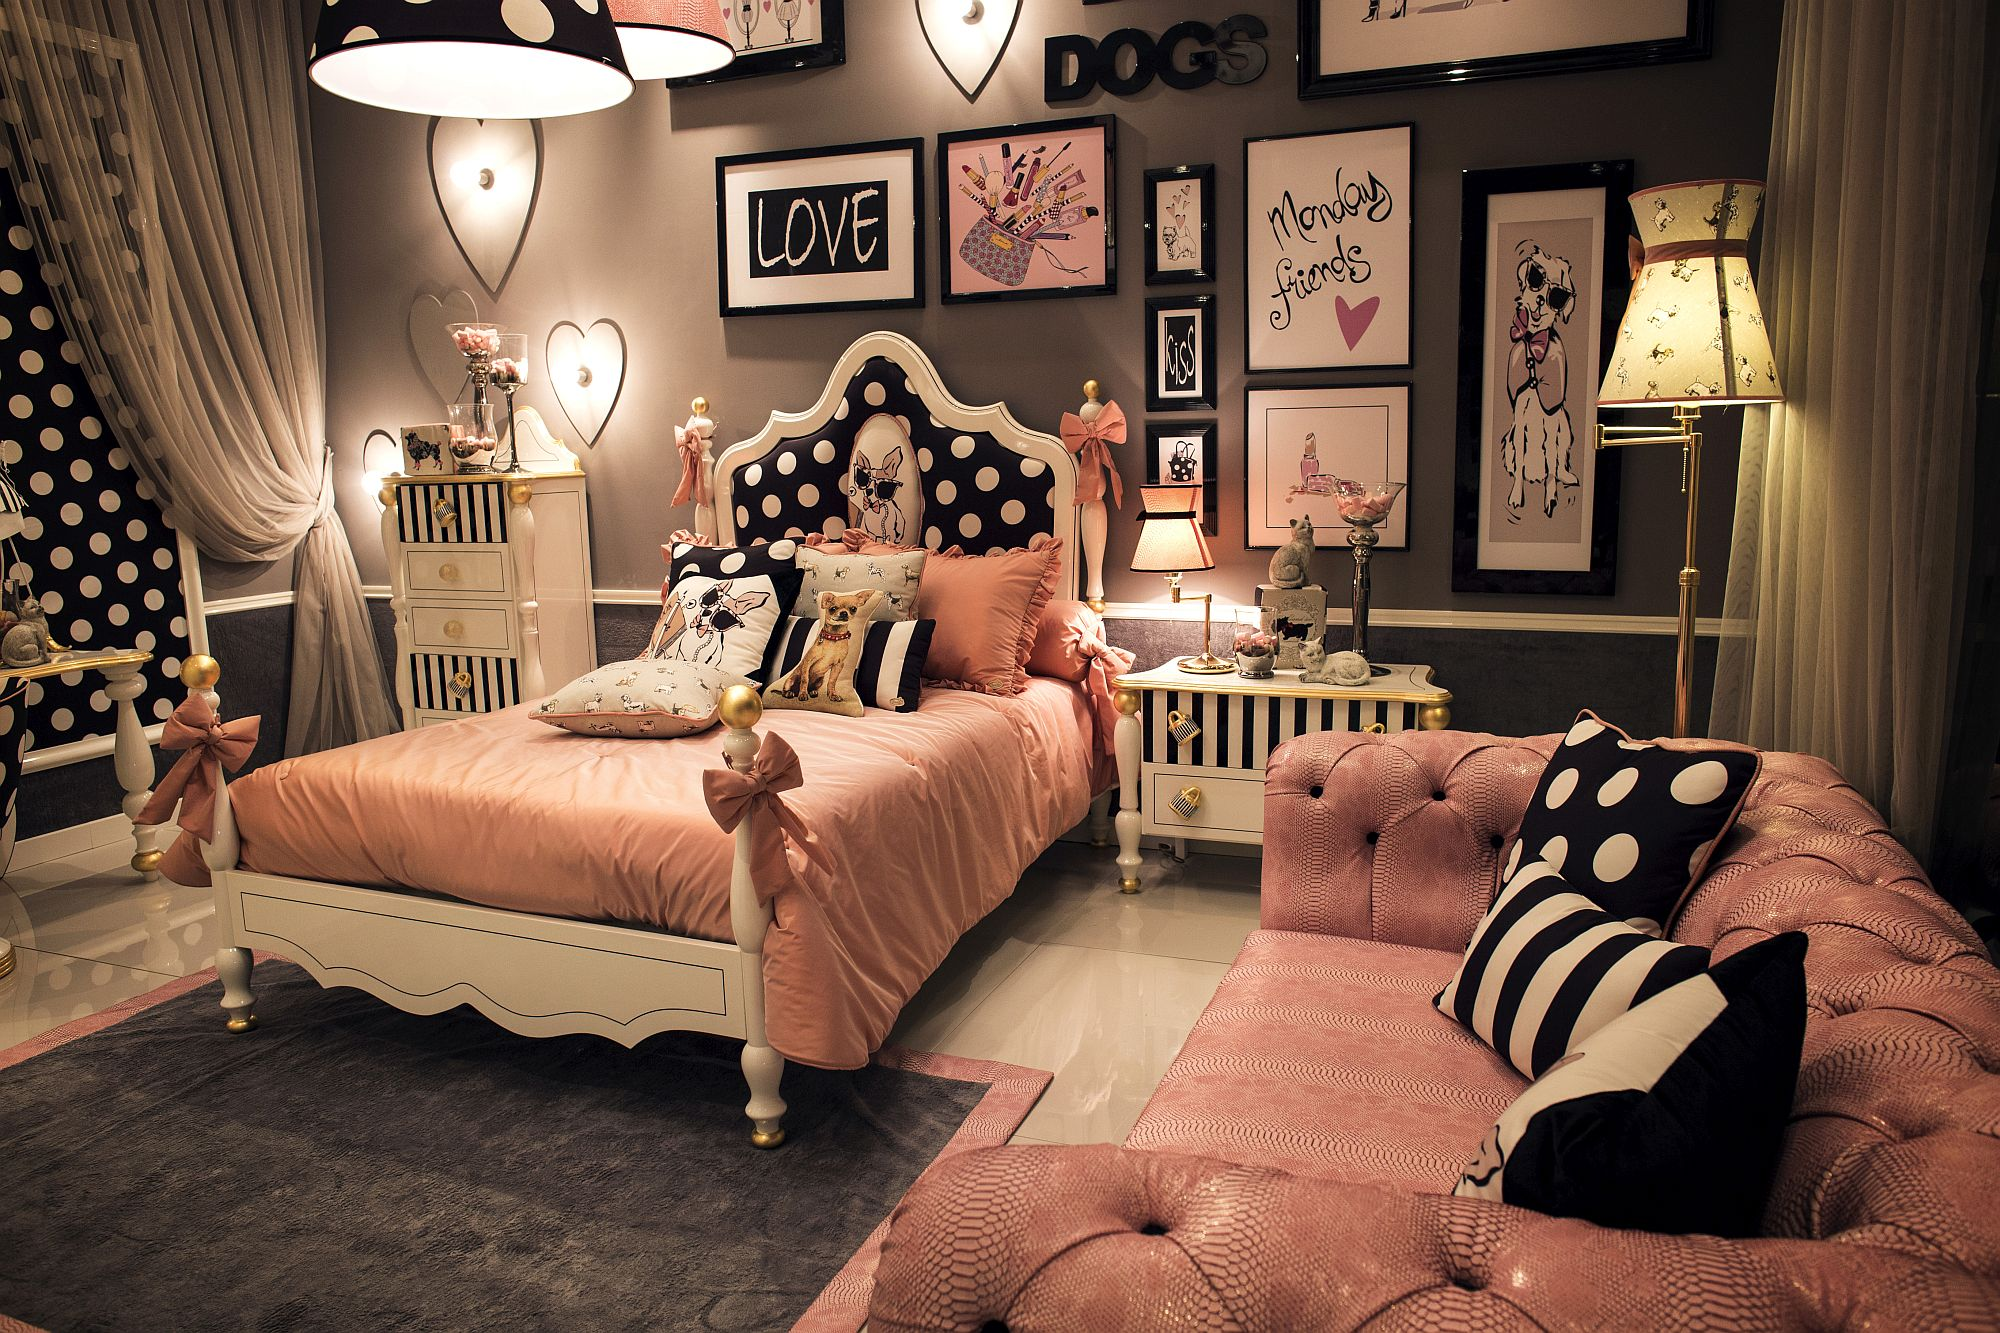 50 Latest Kids' Bedroom Decorating and Furniture Ideas on Bedroom Models  id=76358